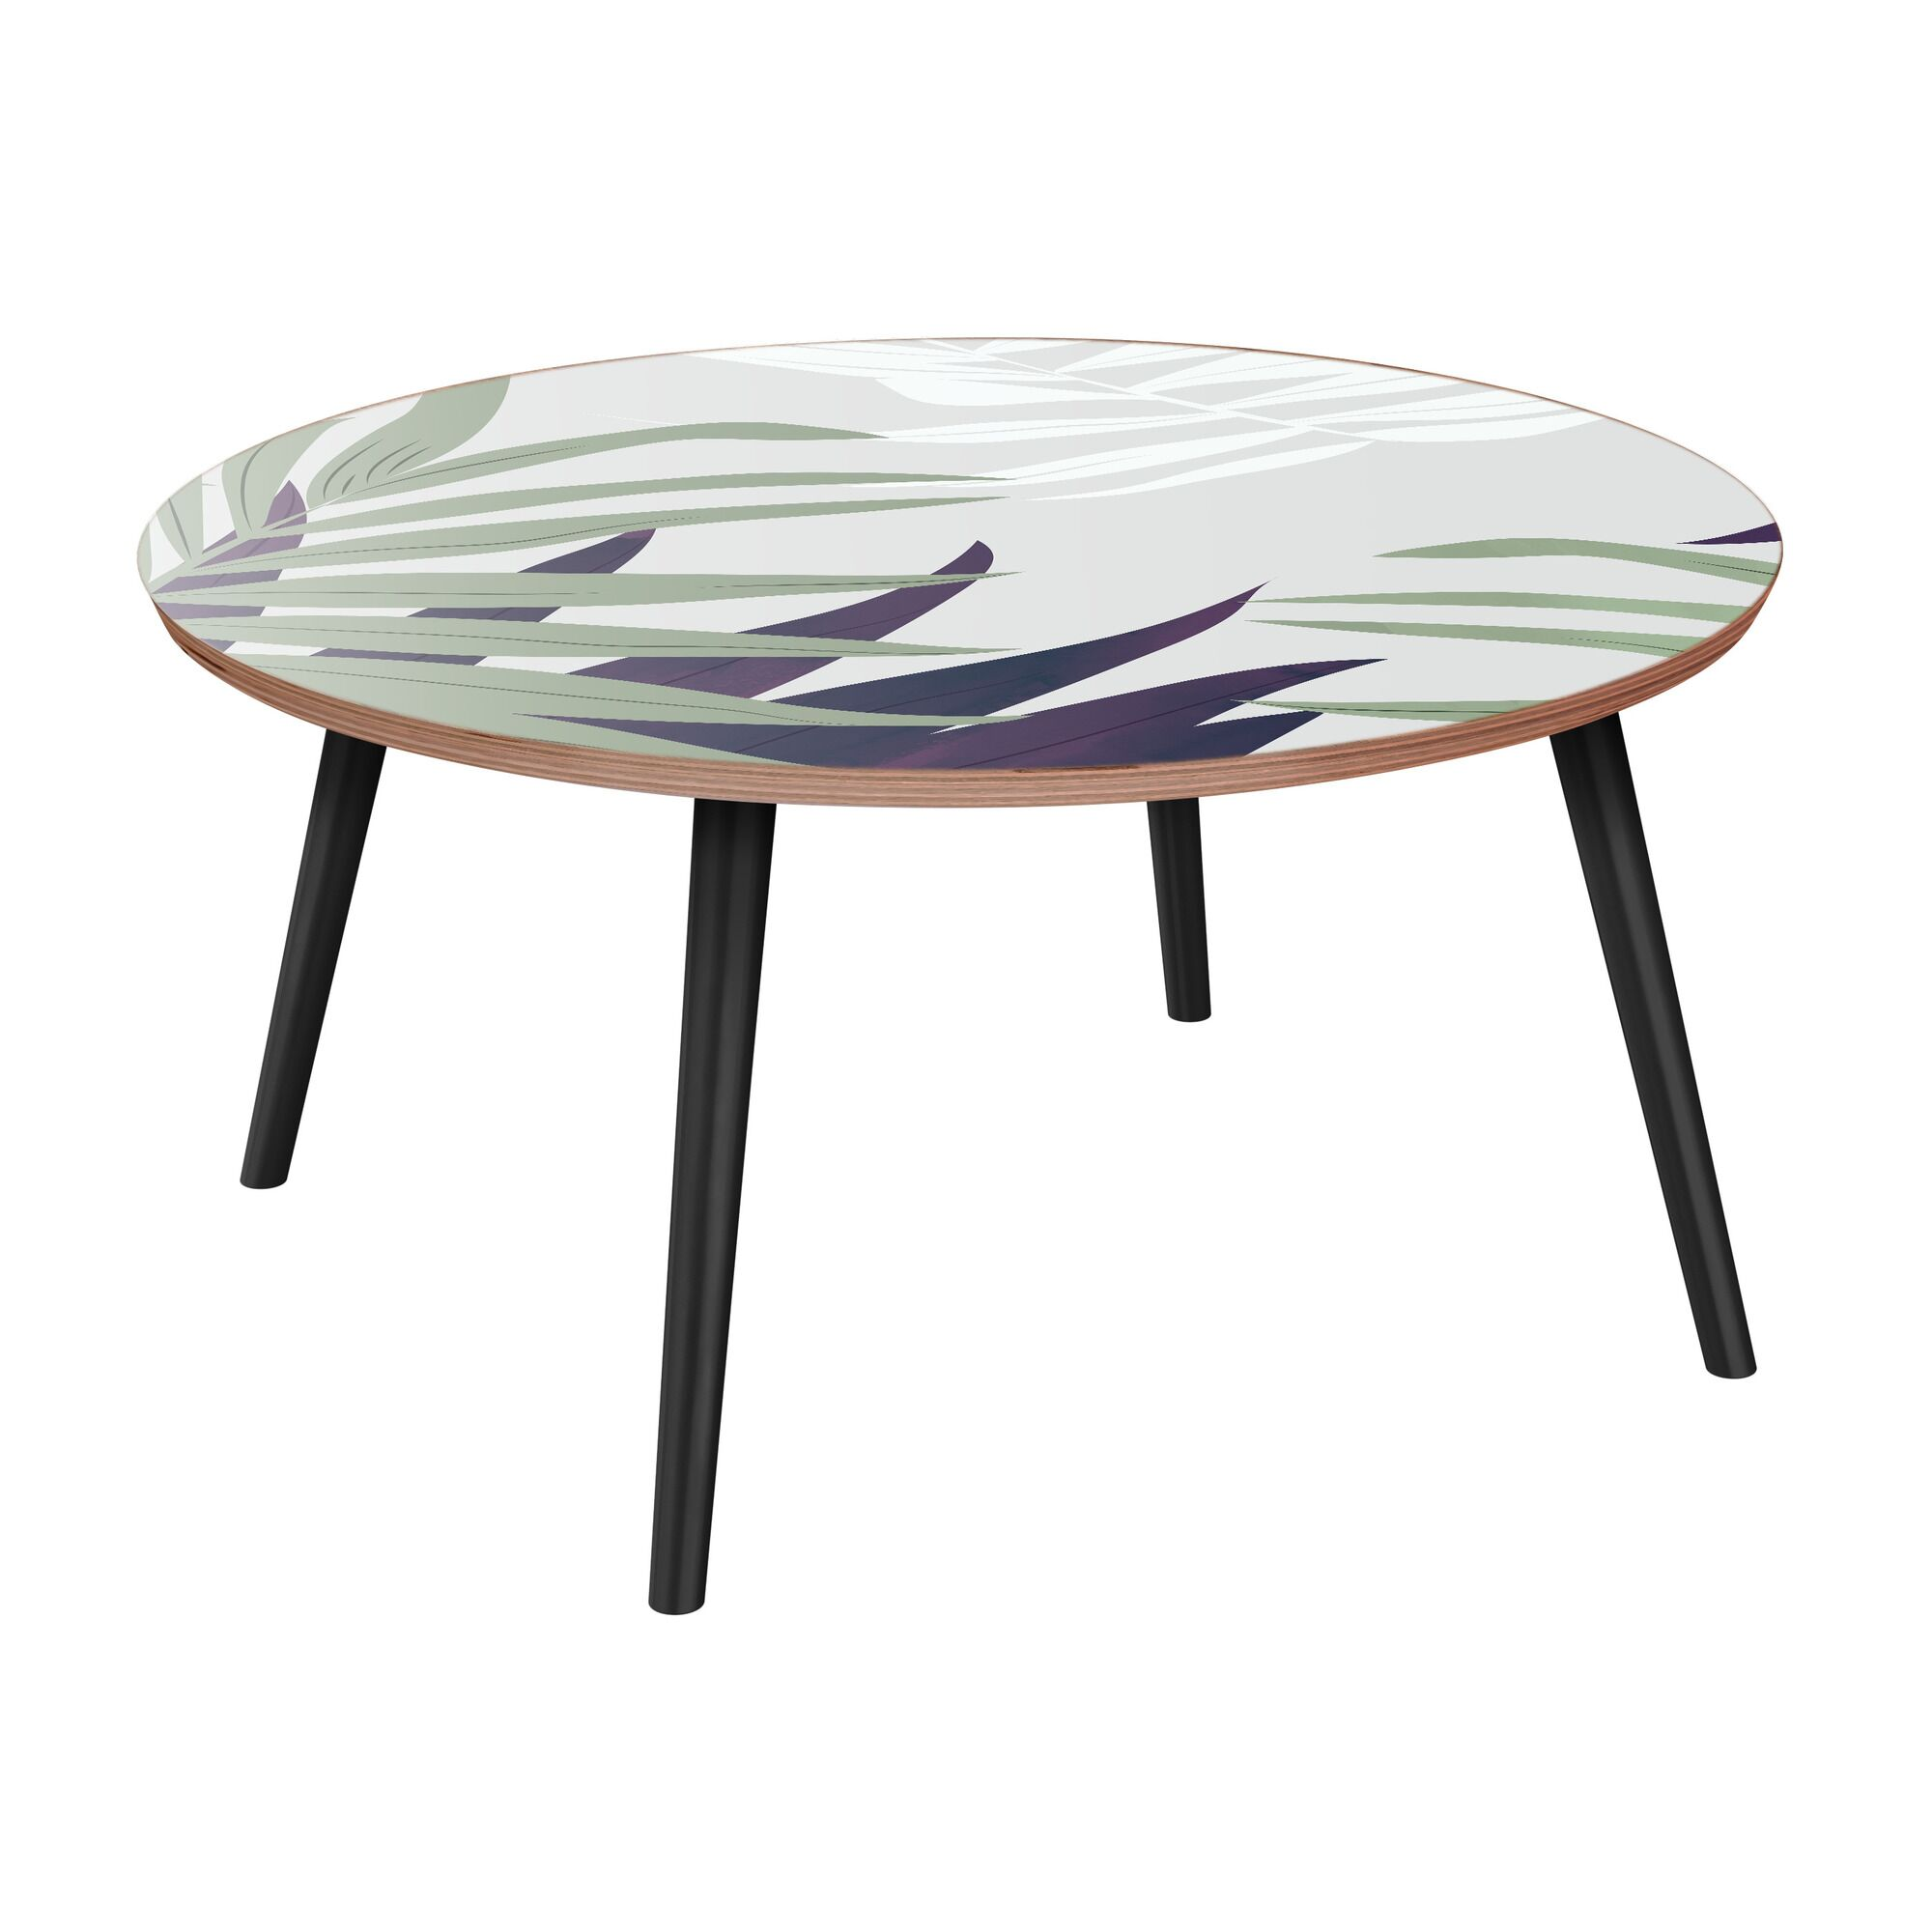 Schermerhorn Coffee Table Table Top Color: Walnut, Table Base Color: Black